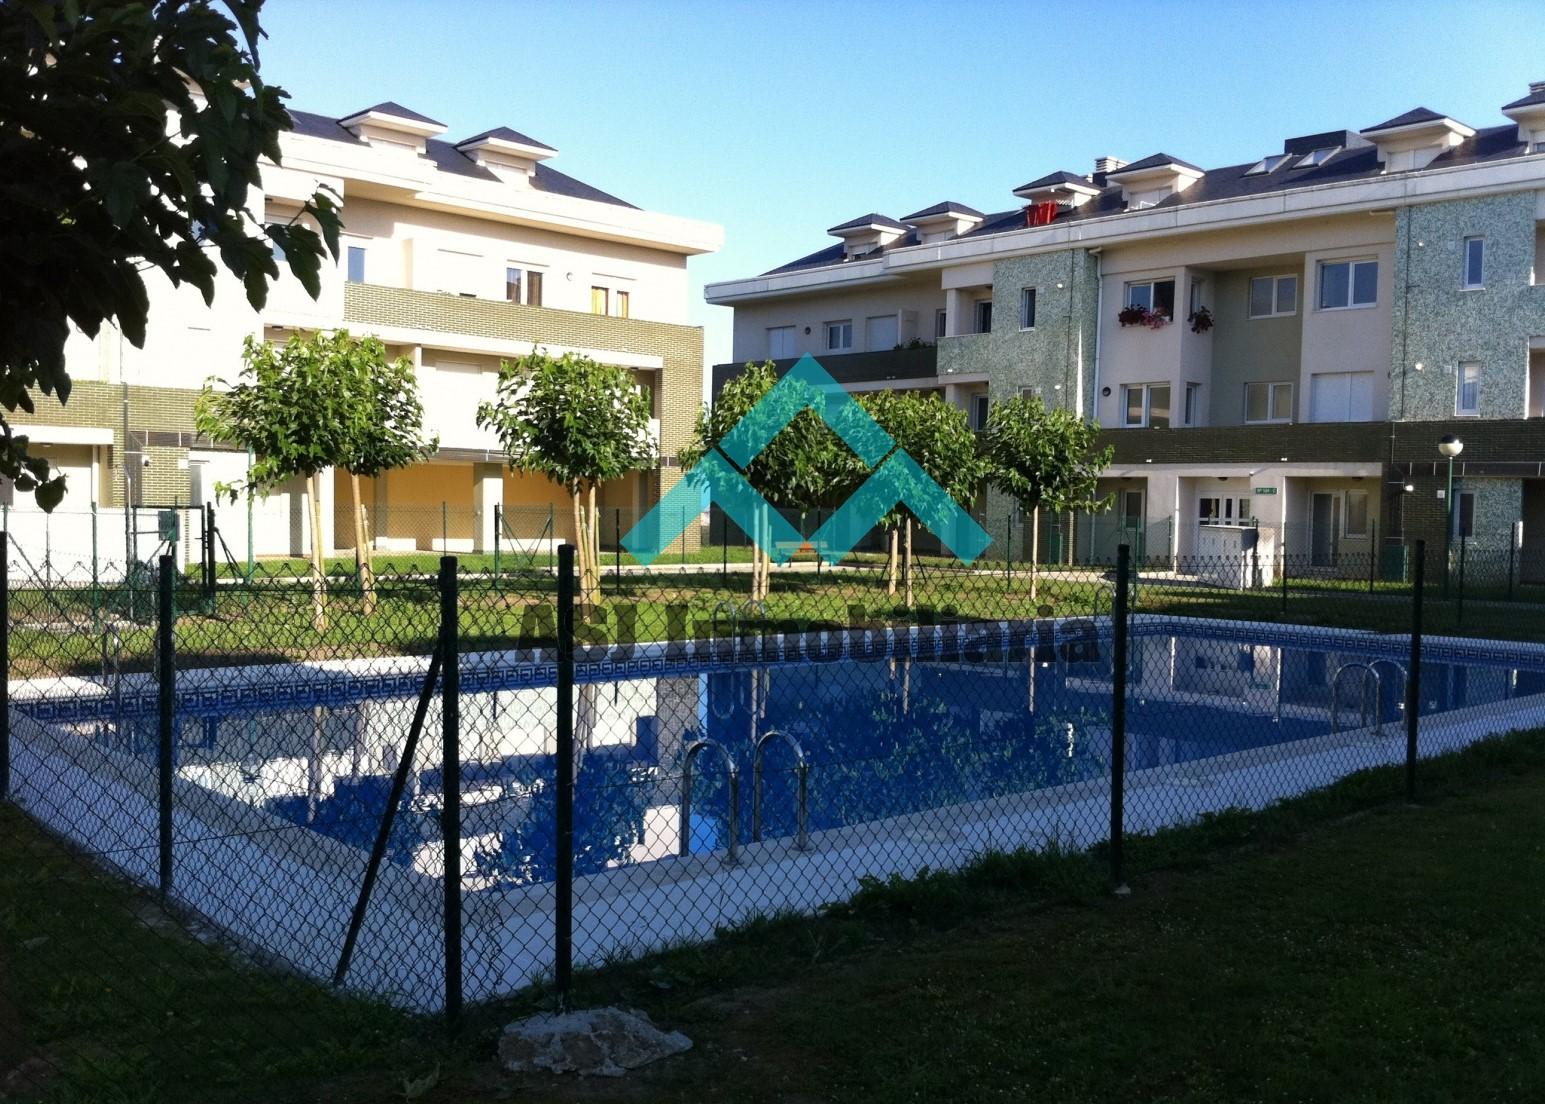 Piso en urbanización con piscina en Suances